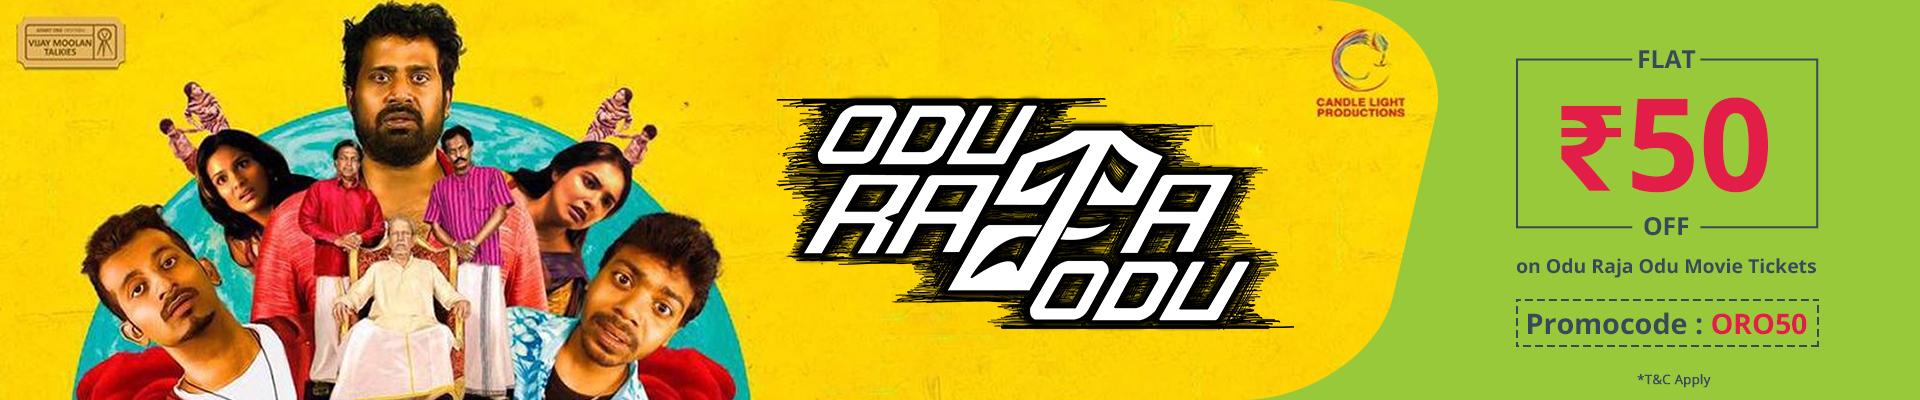 Odu Raja Odu Banner